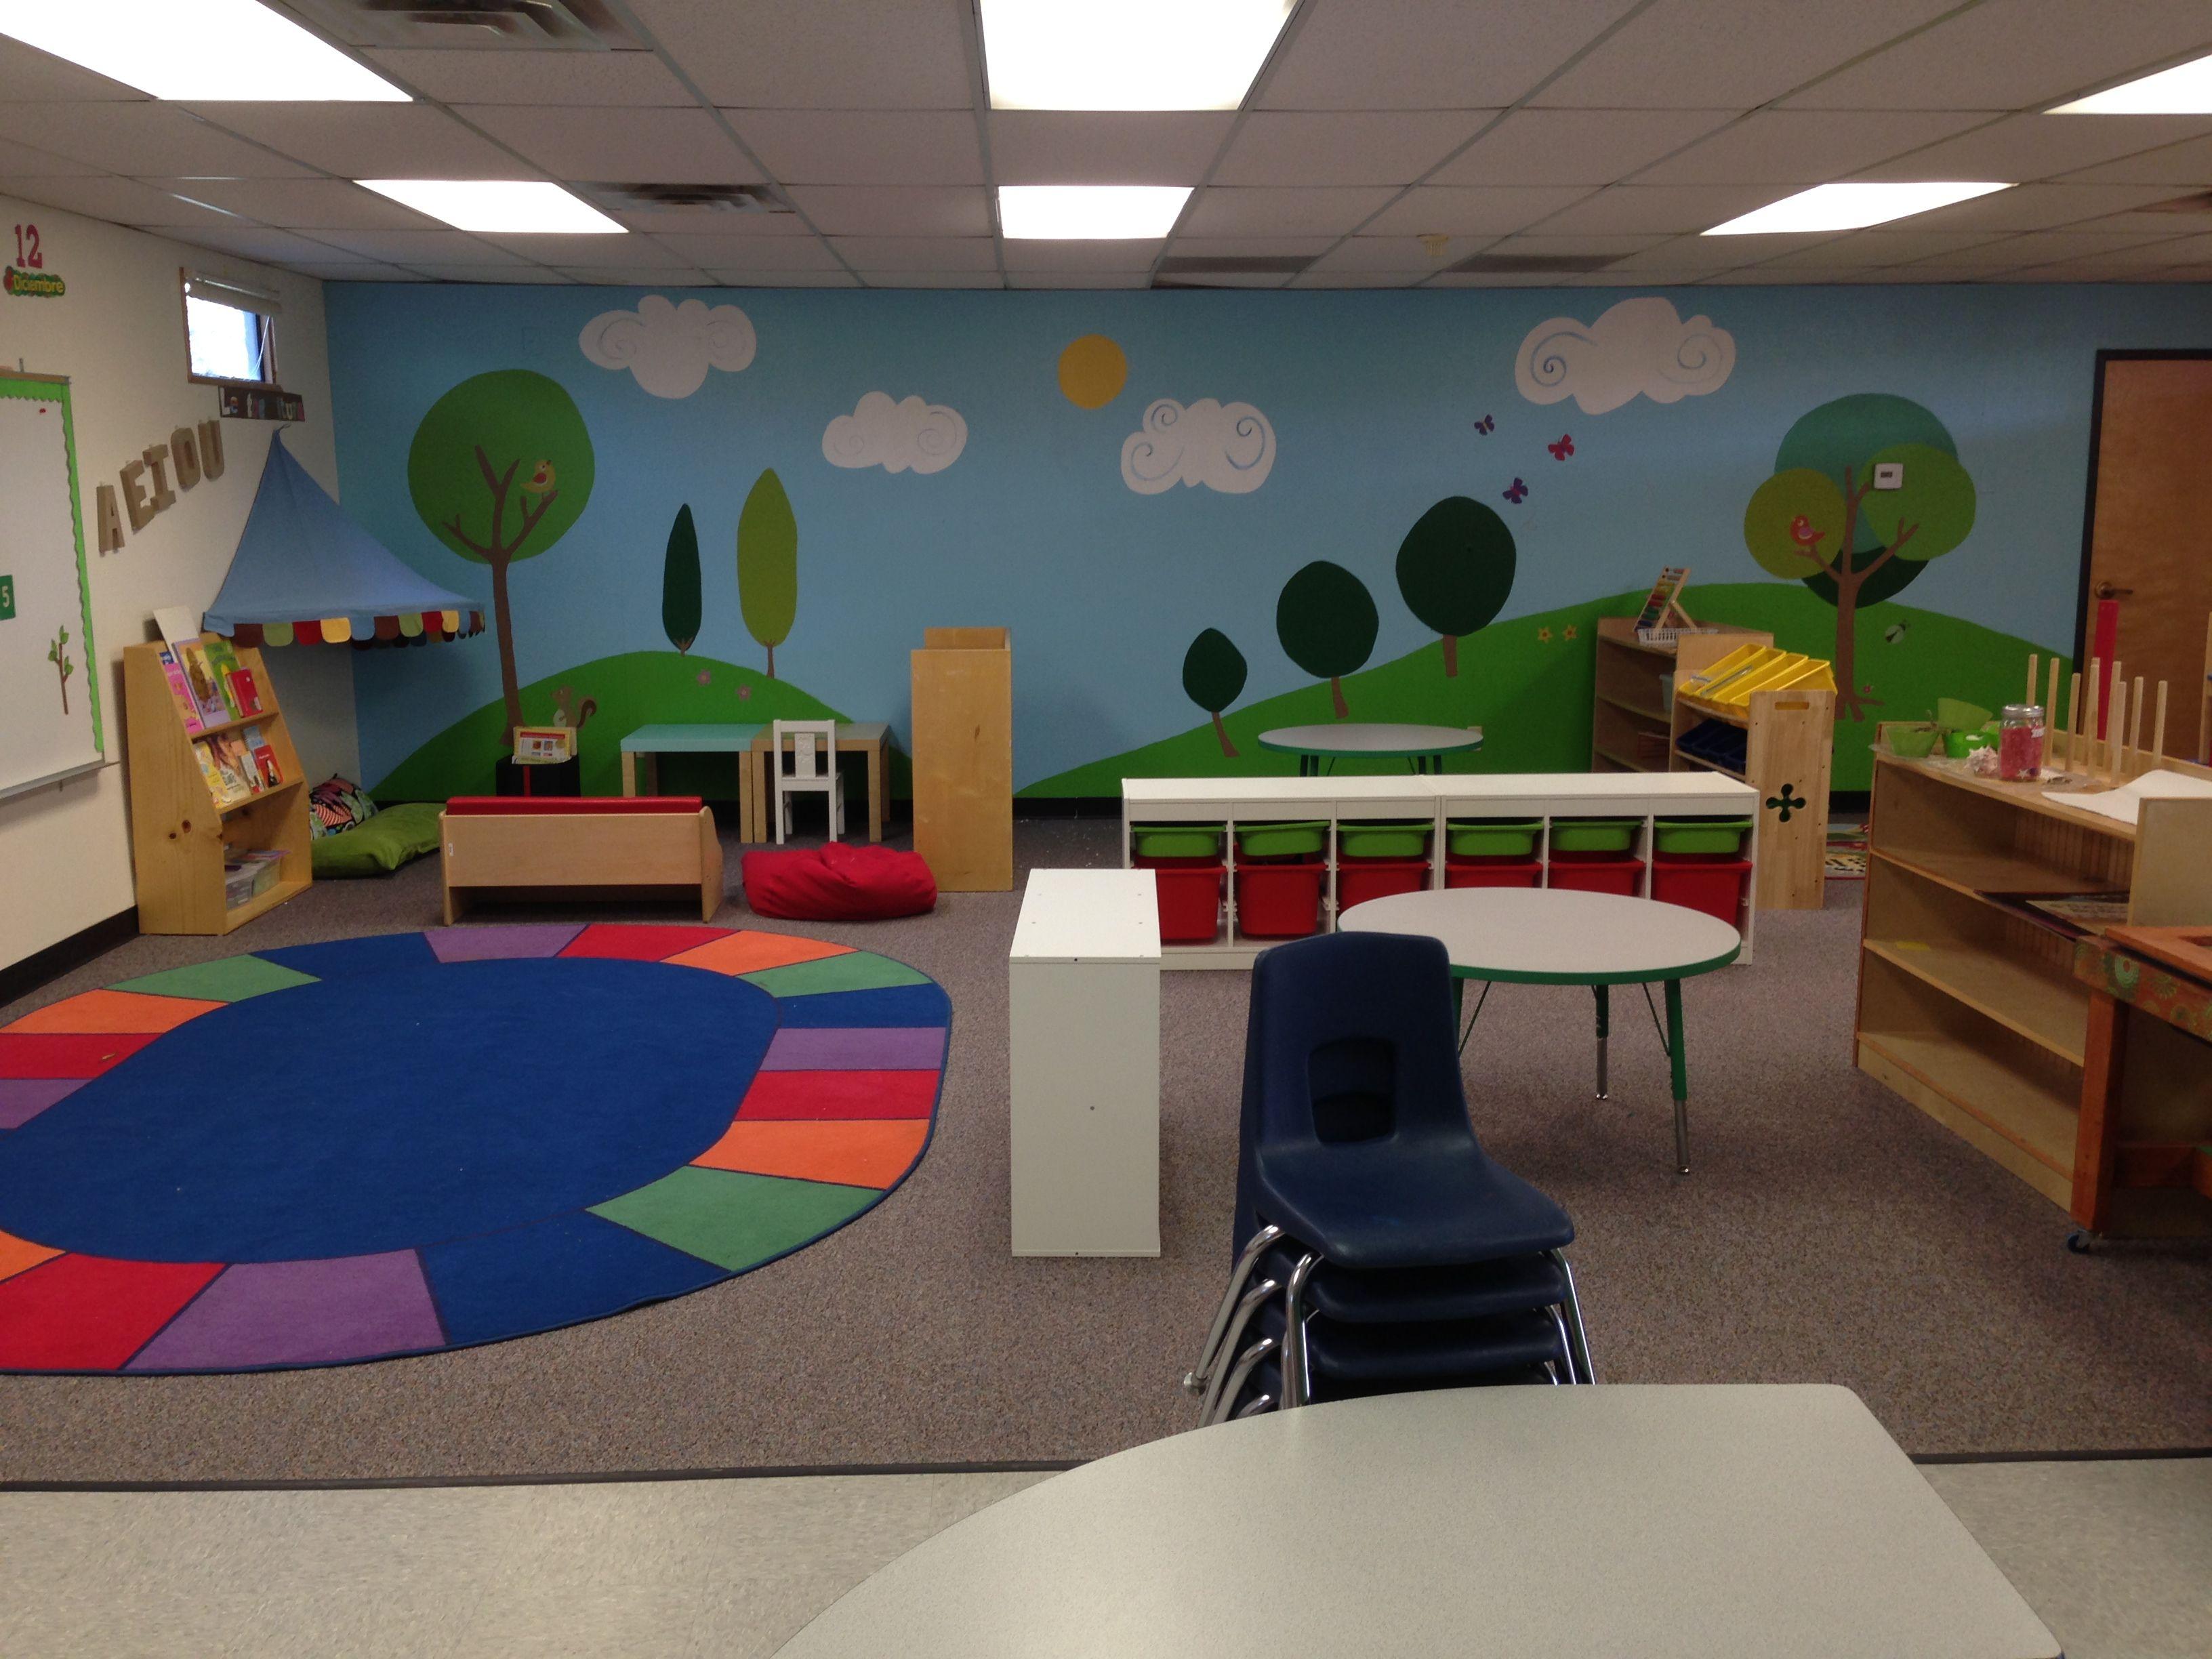 Classroom Mural Design ~ My classroom decor mural ikea phoenix az